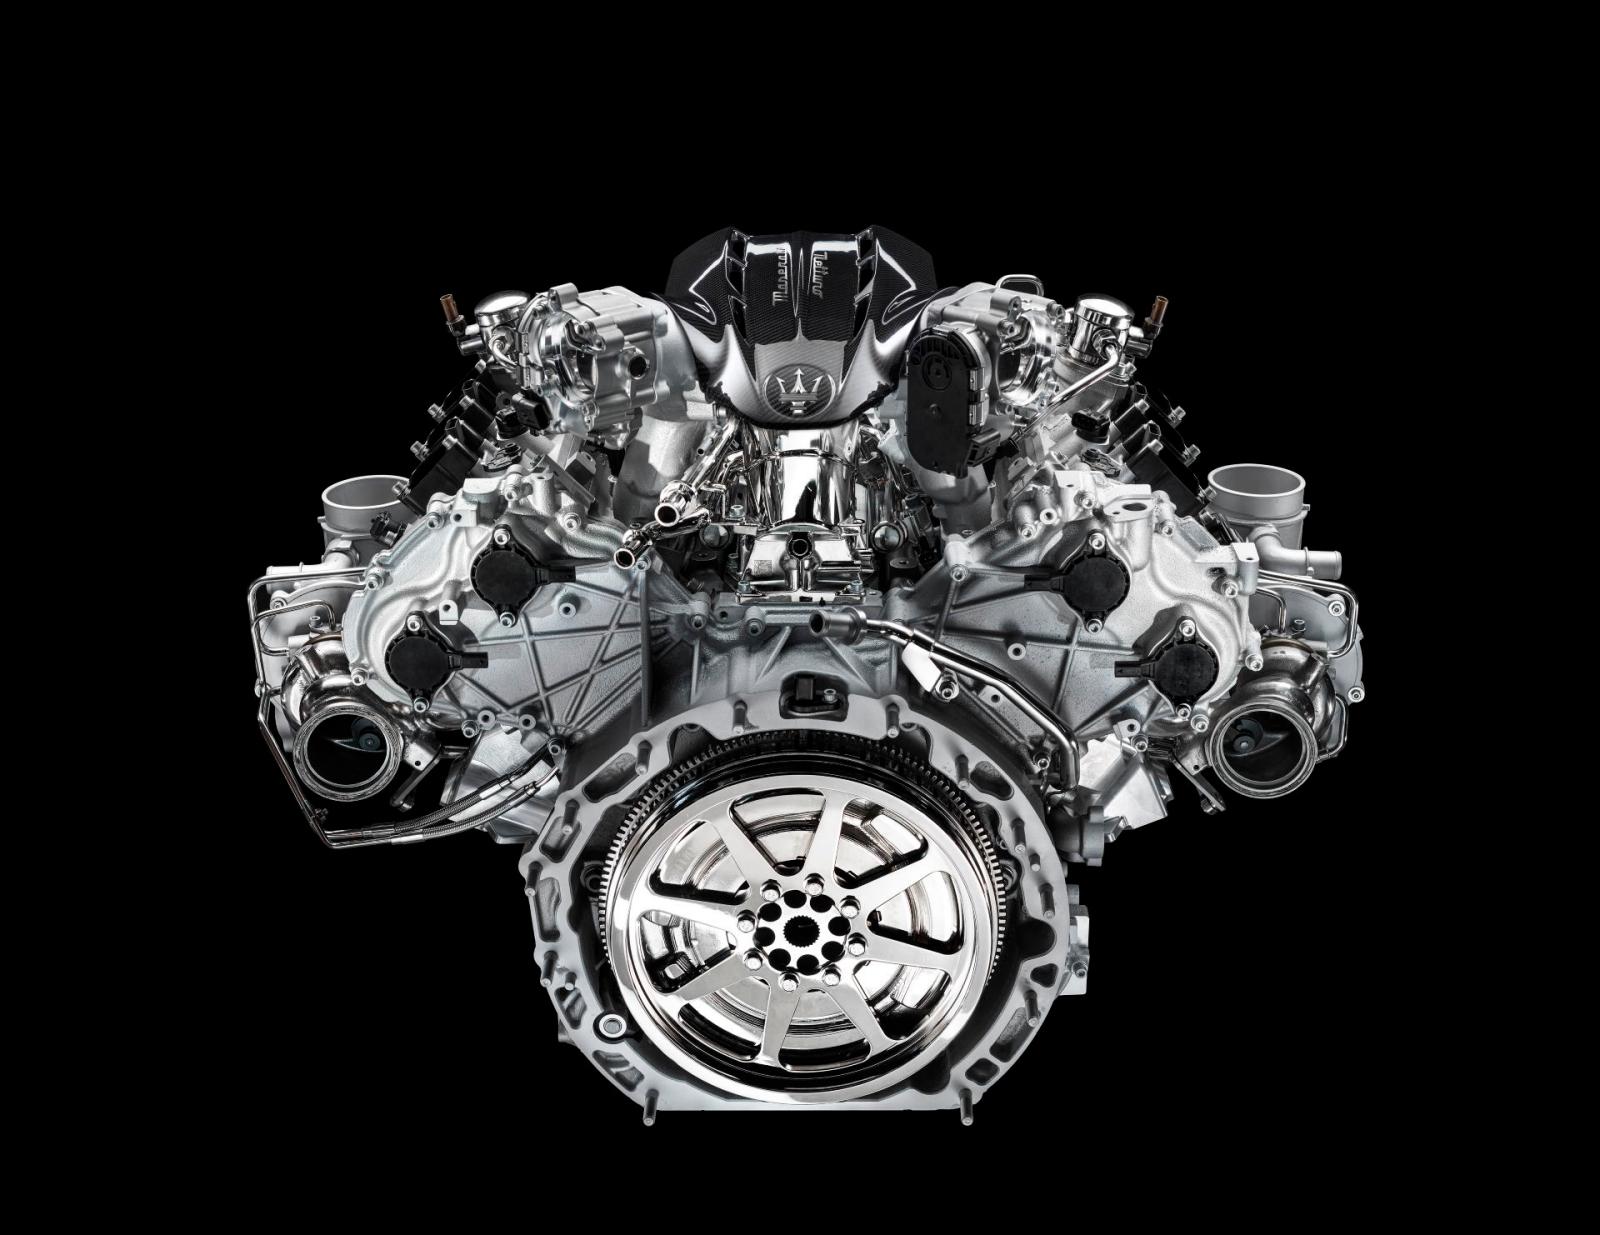 Maserati-Engine-2